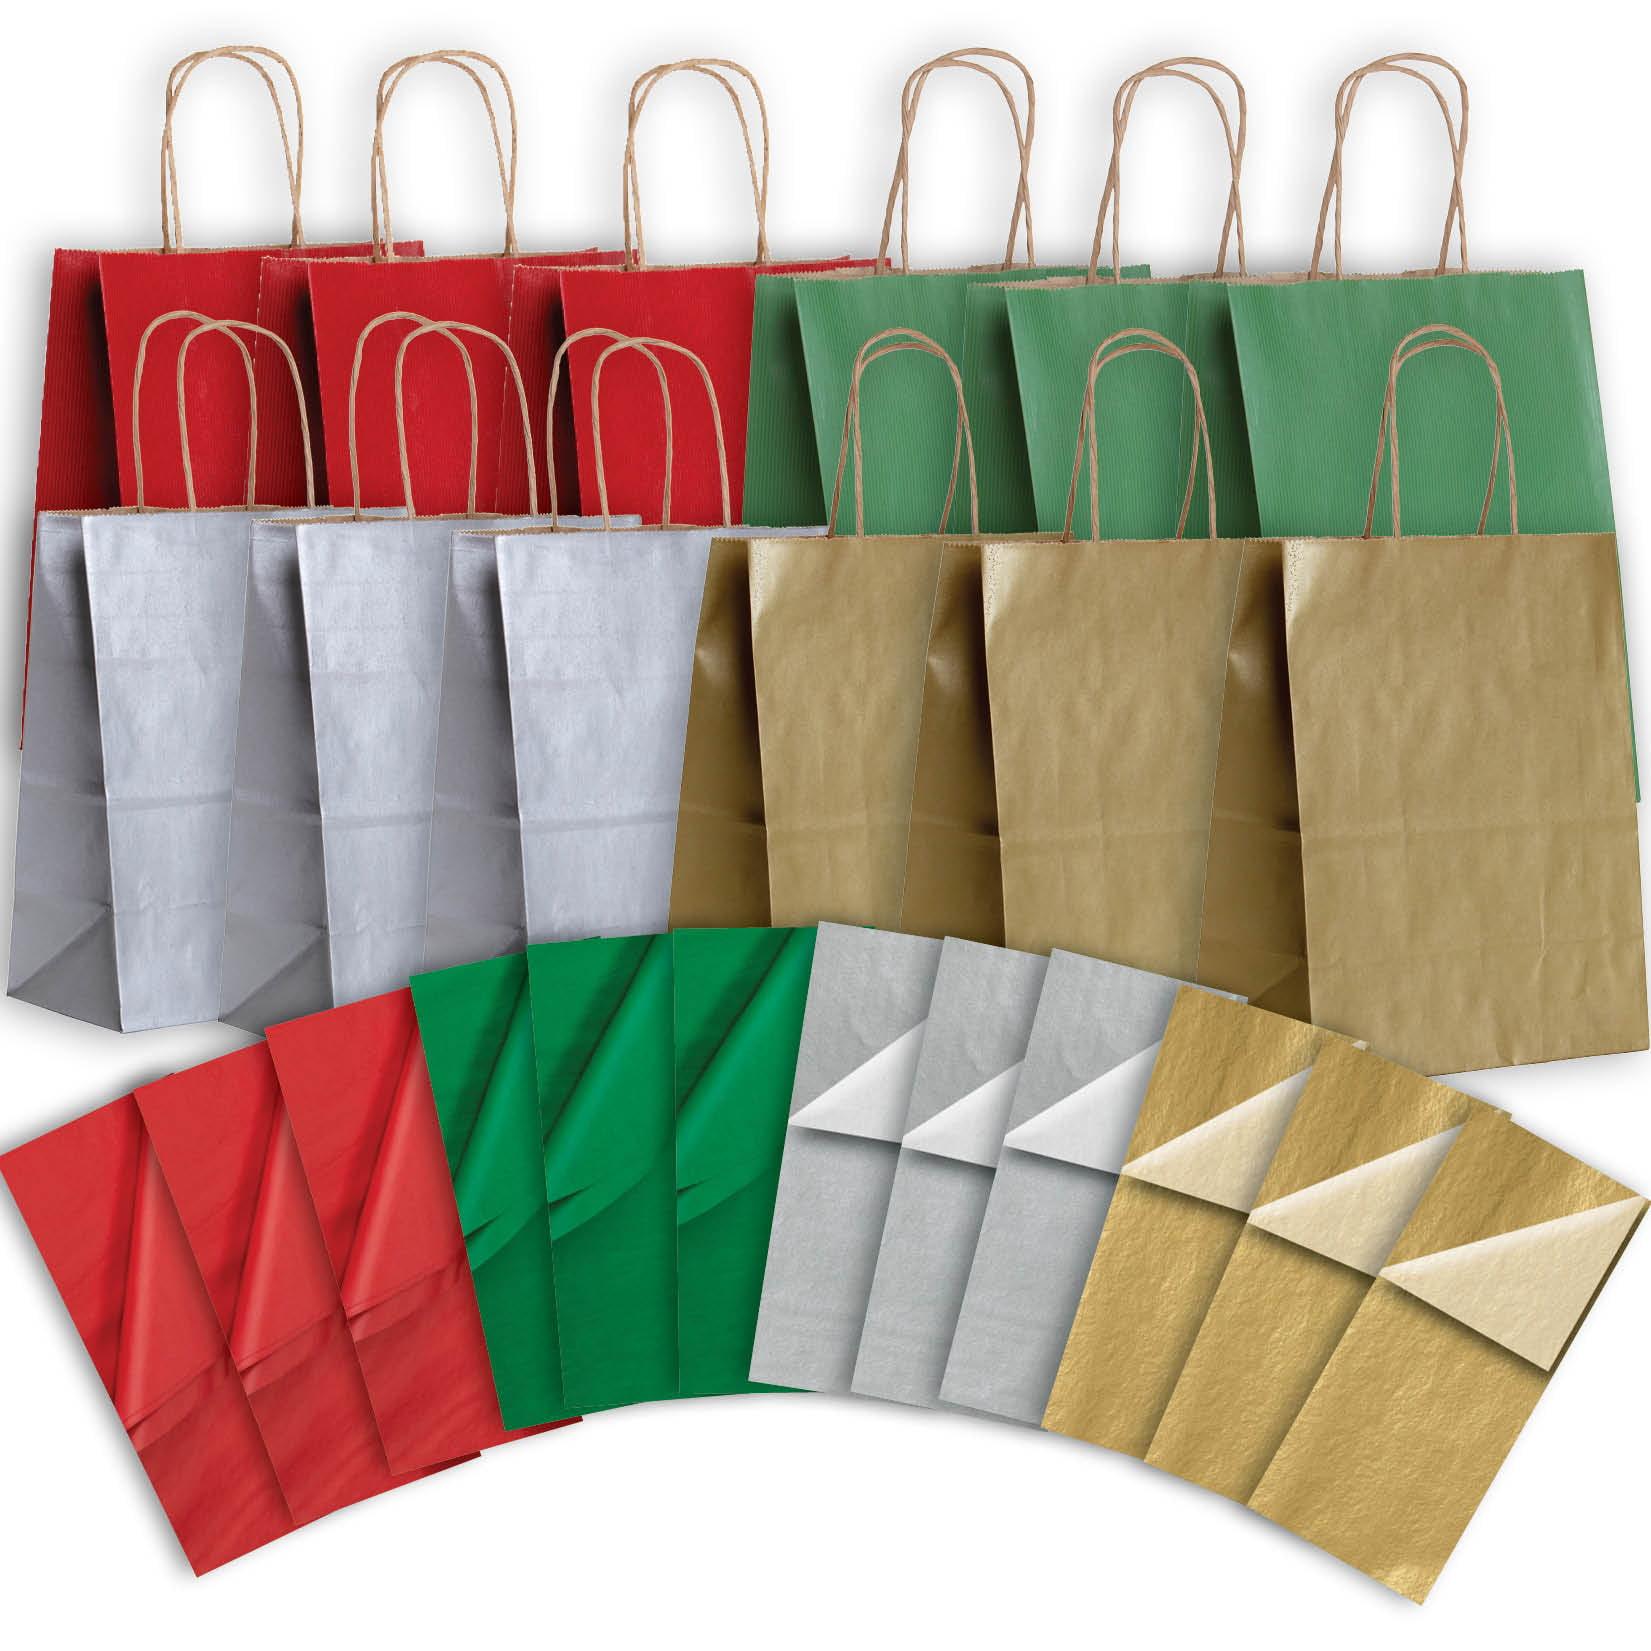 Jillson & Roberts Eco-Friendly Kraft Medium Gift Bag & Tissue Assortment, Christmas (12 Bags)